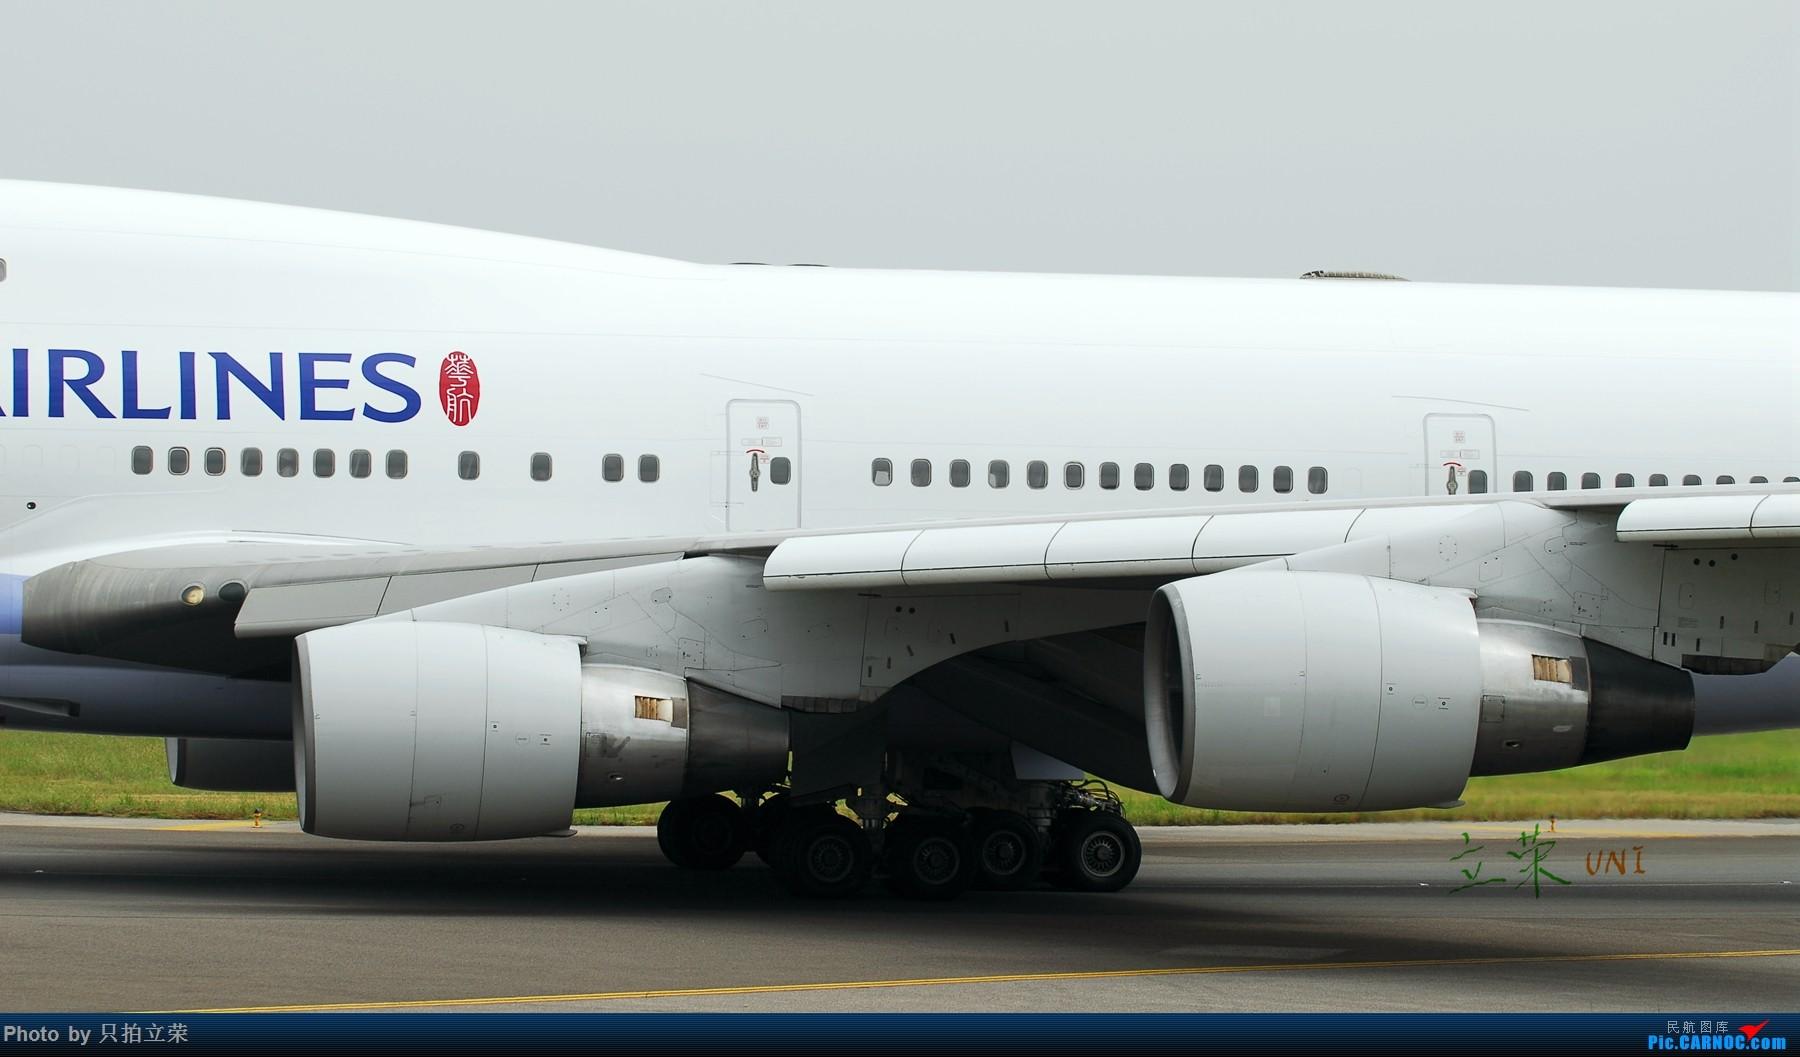 Re:[原创]第一次发图,长沙的大梅花们 BOEING 747-400 B-18205 中国长沙黄花国际机场